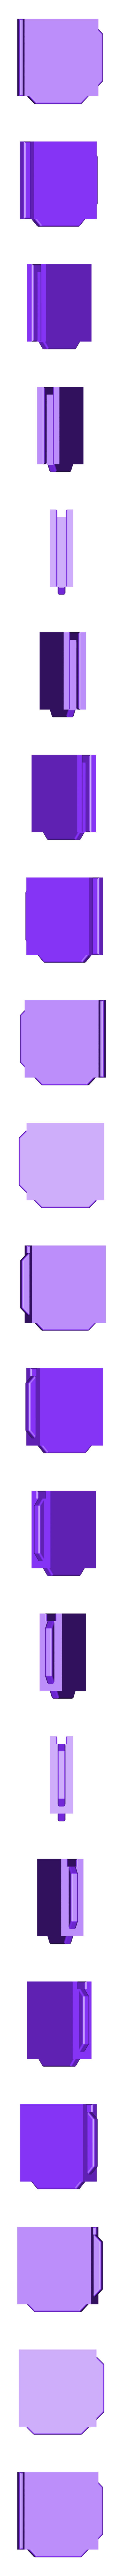 Piece - Part 24.stl Download free STL file Taquin CULTS / Sliding Puzzle • 3D print model, Valelab3D